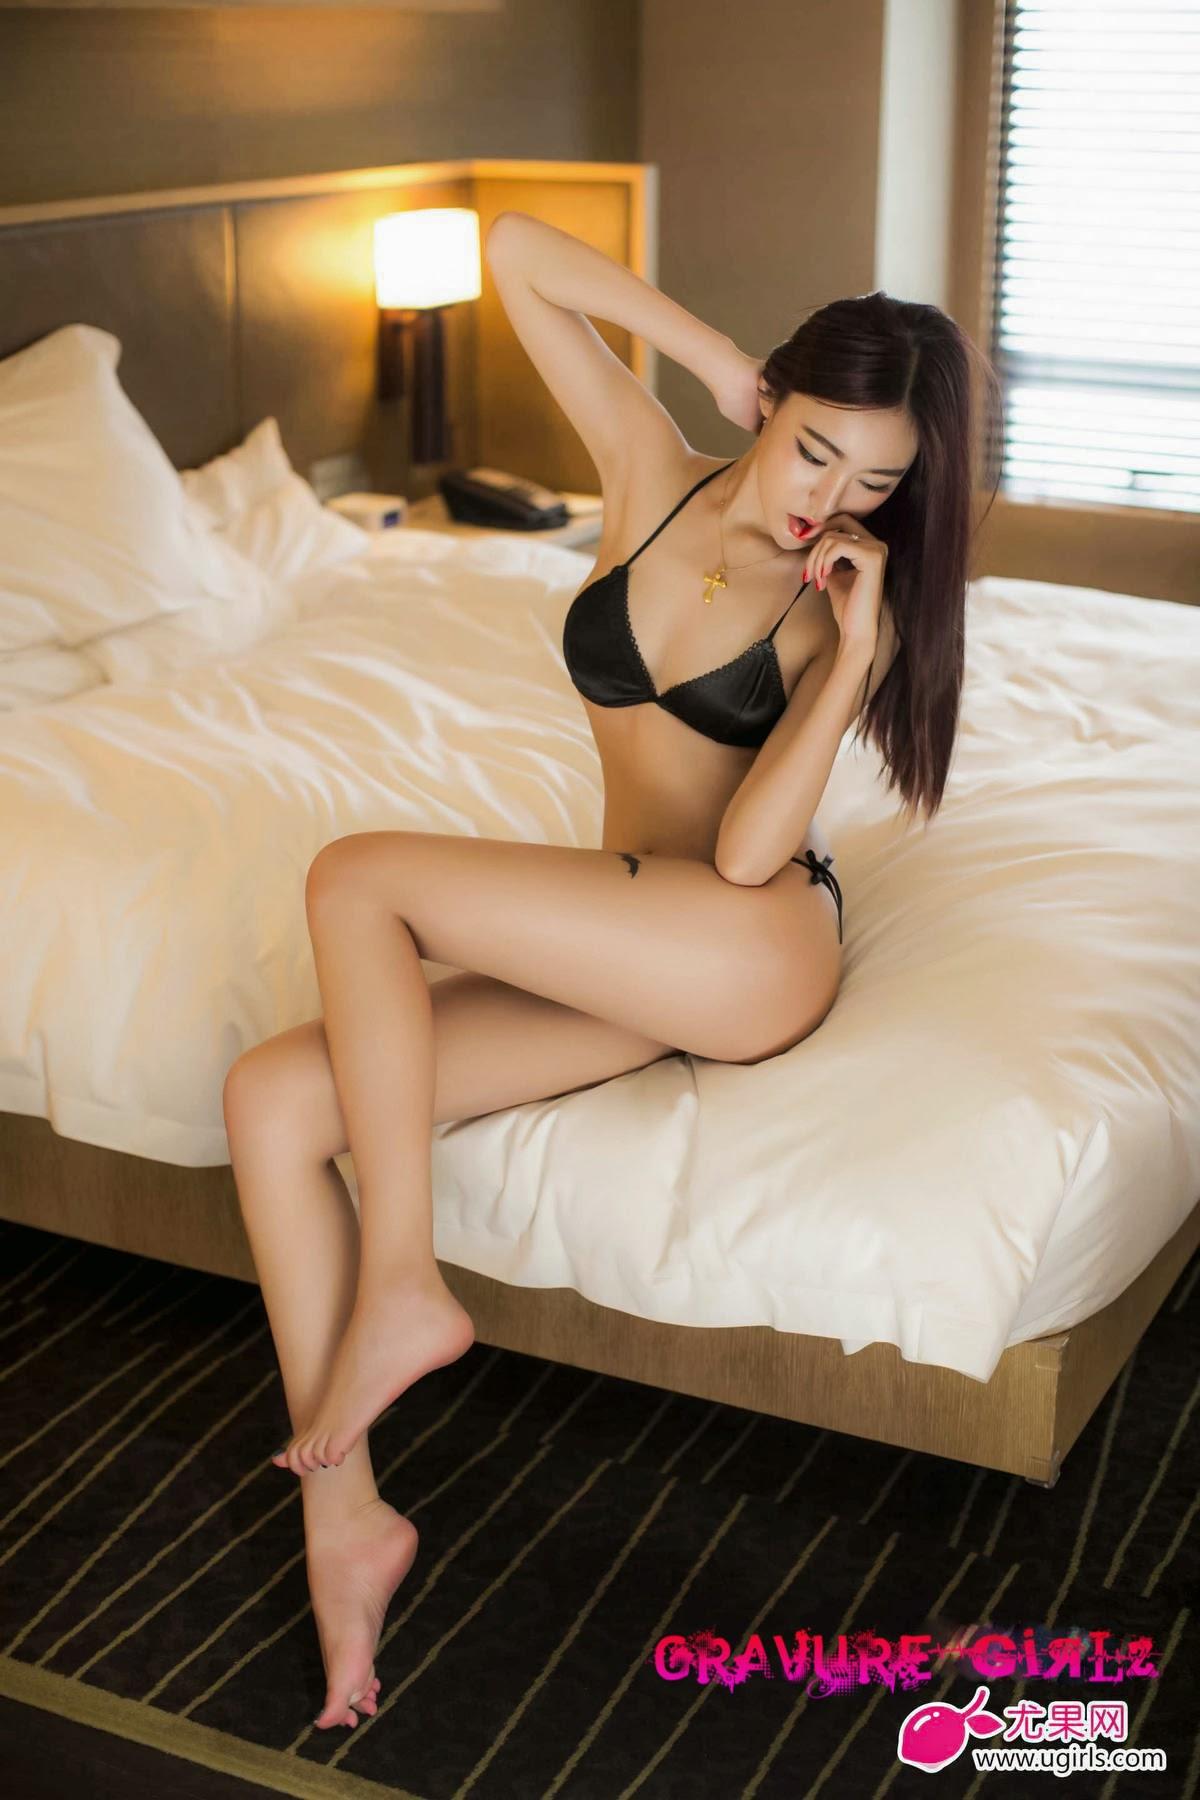 Chi Wan Guo 湿婉郭 | Young Chinese Girl Hot! Ugirls_尤果网 No.26 ...